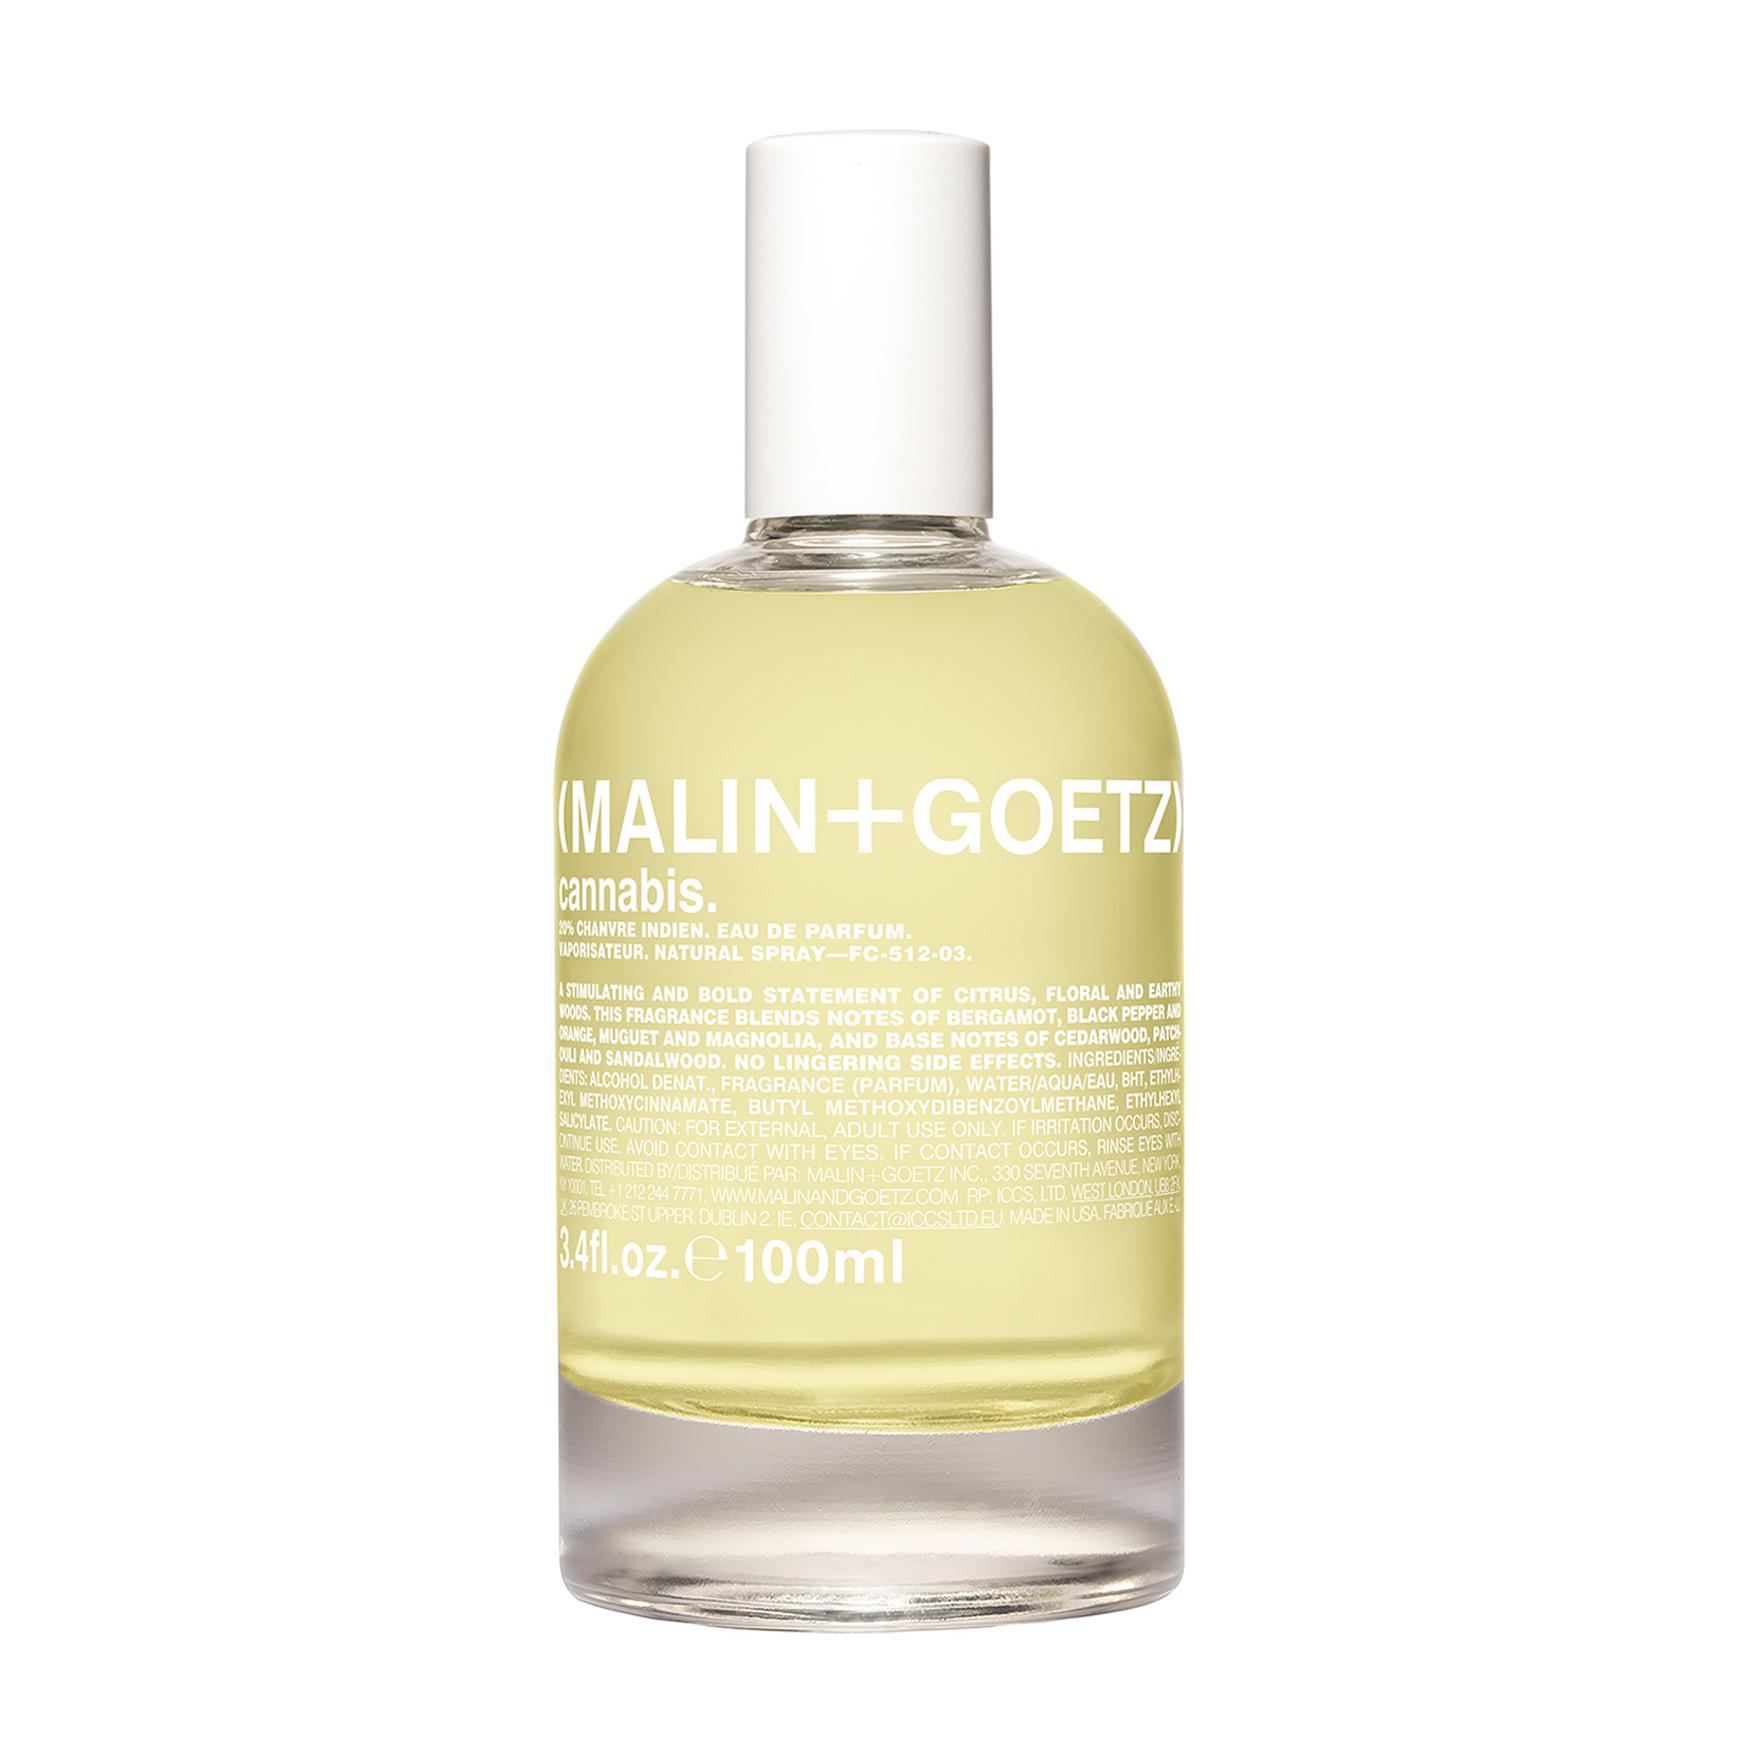 Malin Goetz Cannabis Eau De Parfum Space Nk